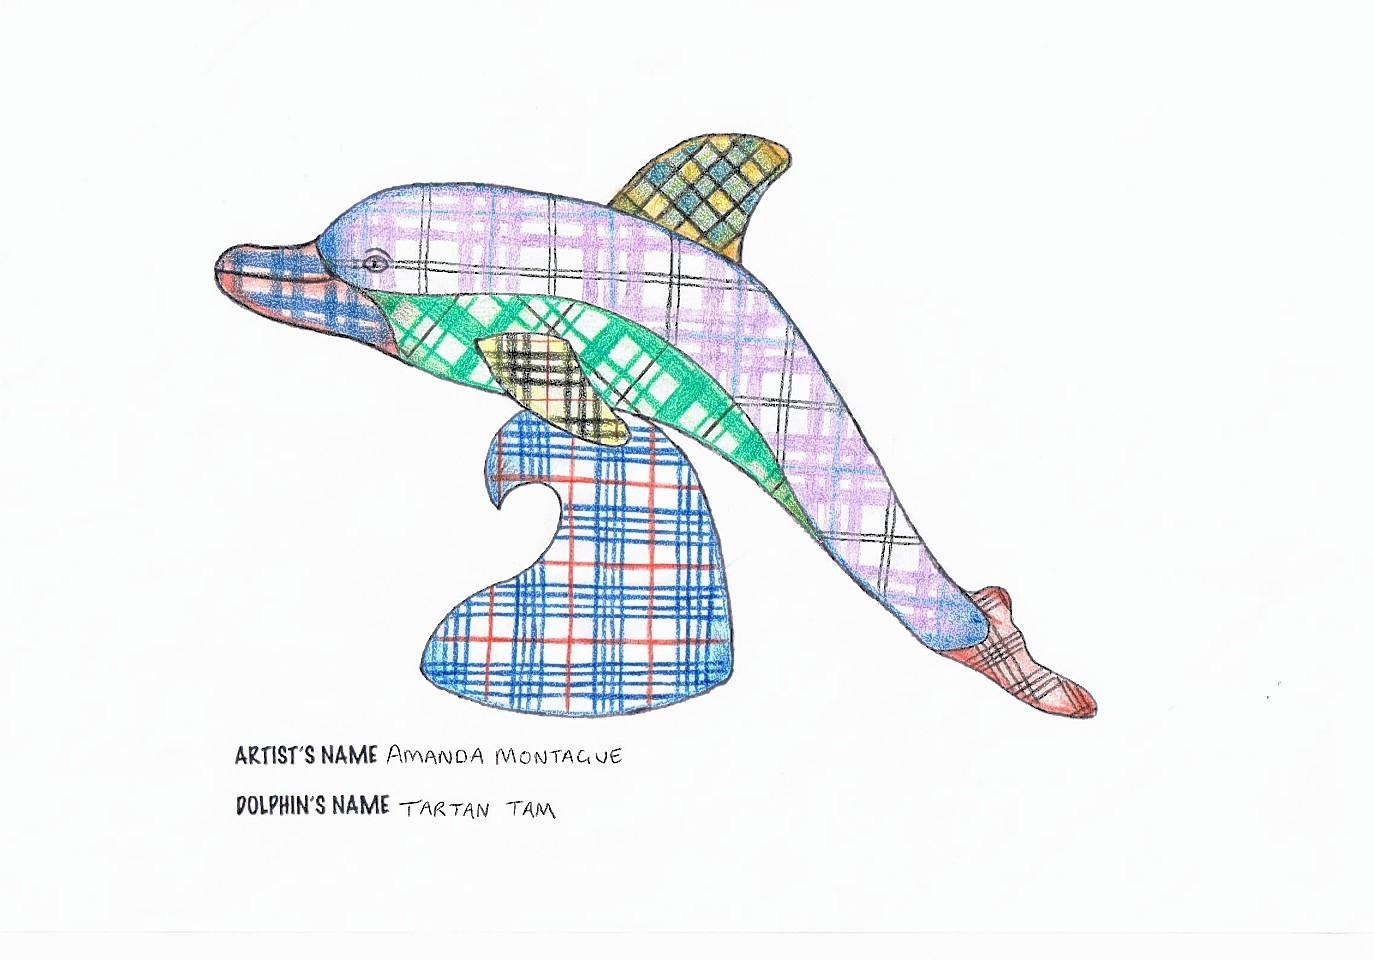 The winning dolphin design